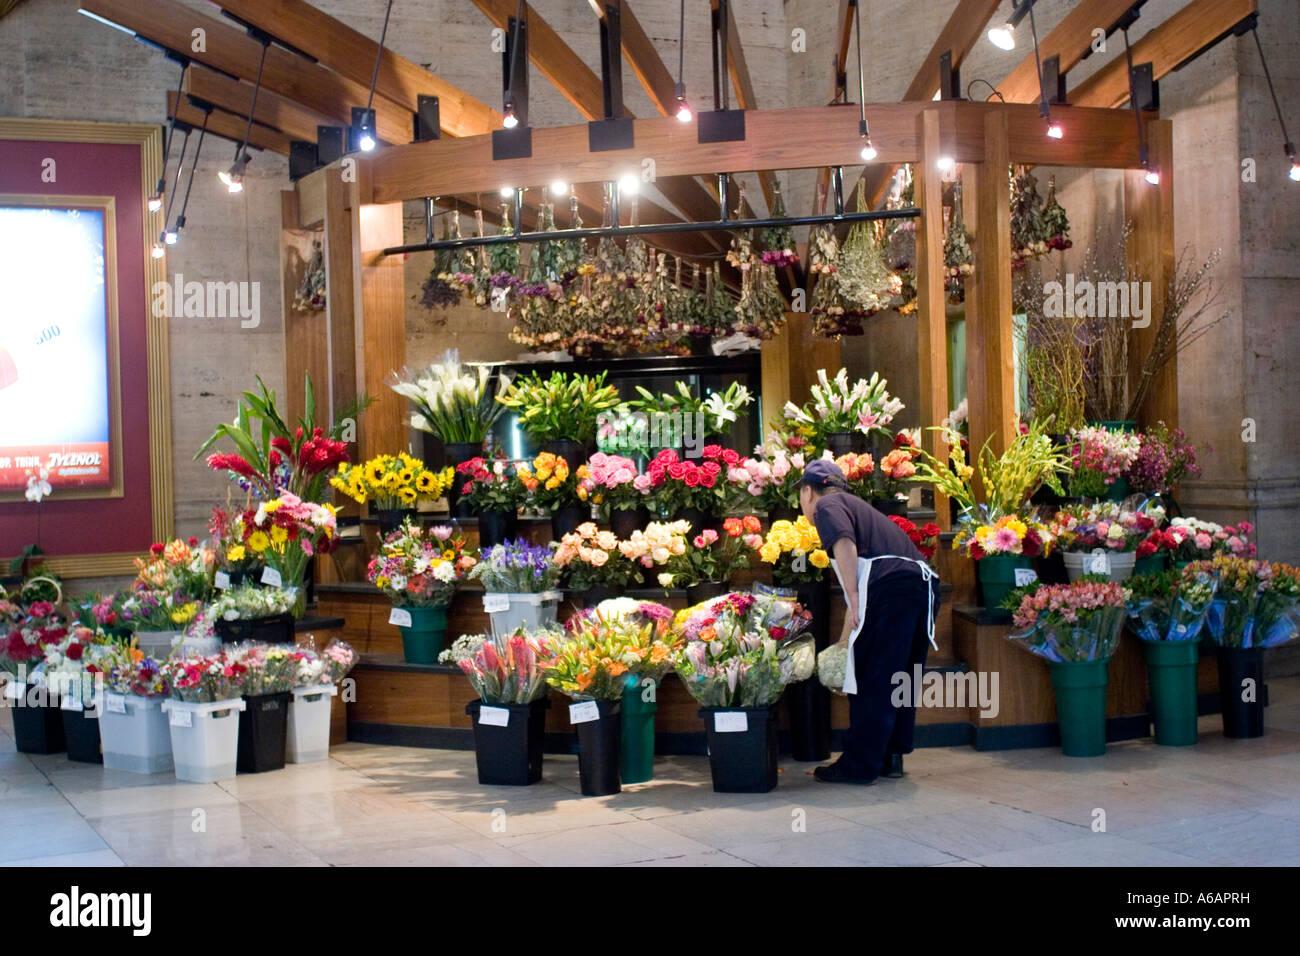 Flower stand 30th Street Station Philadelphia Pennsylvania PA USA - Stock Image